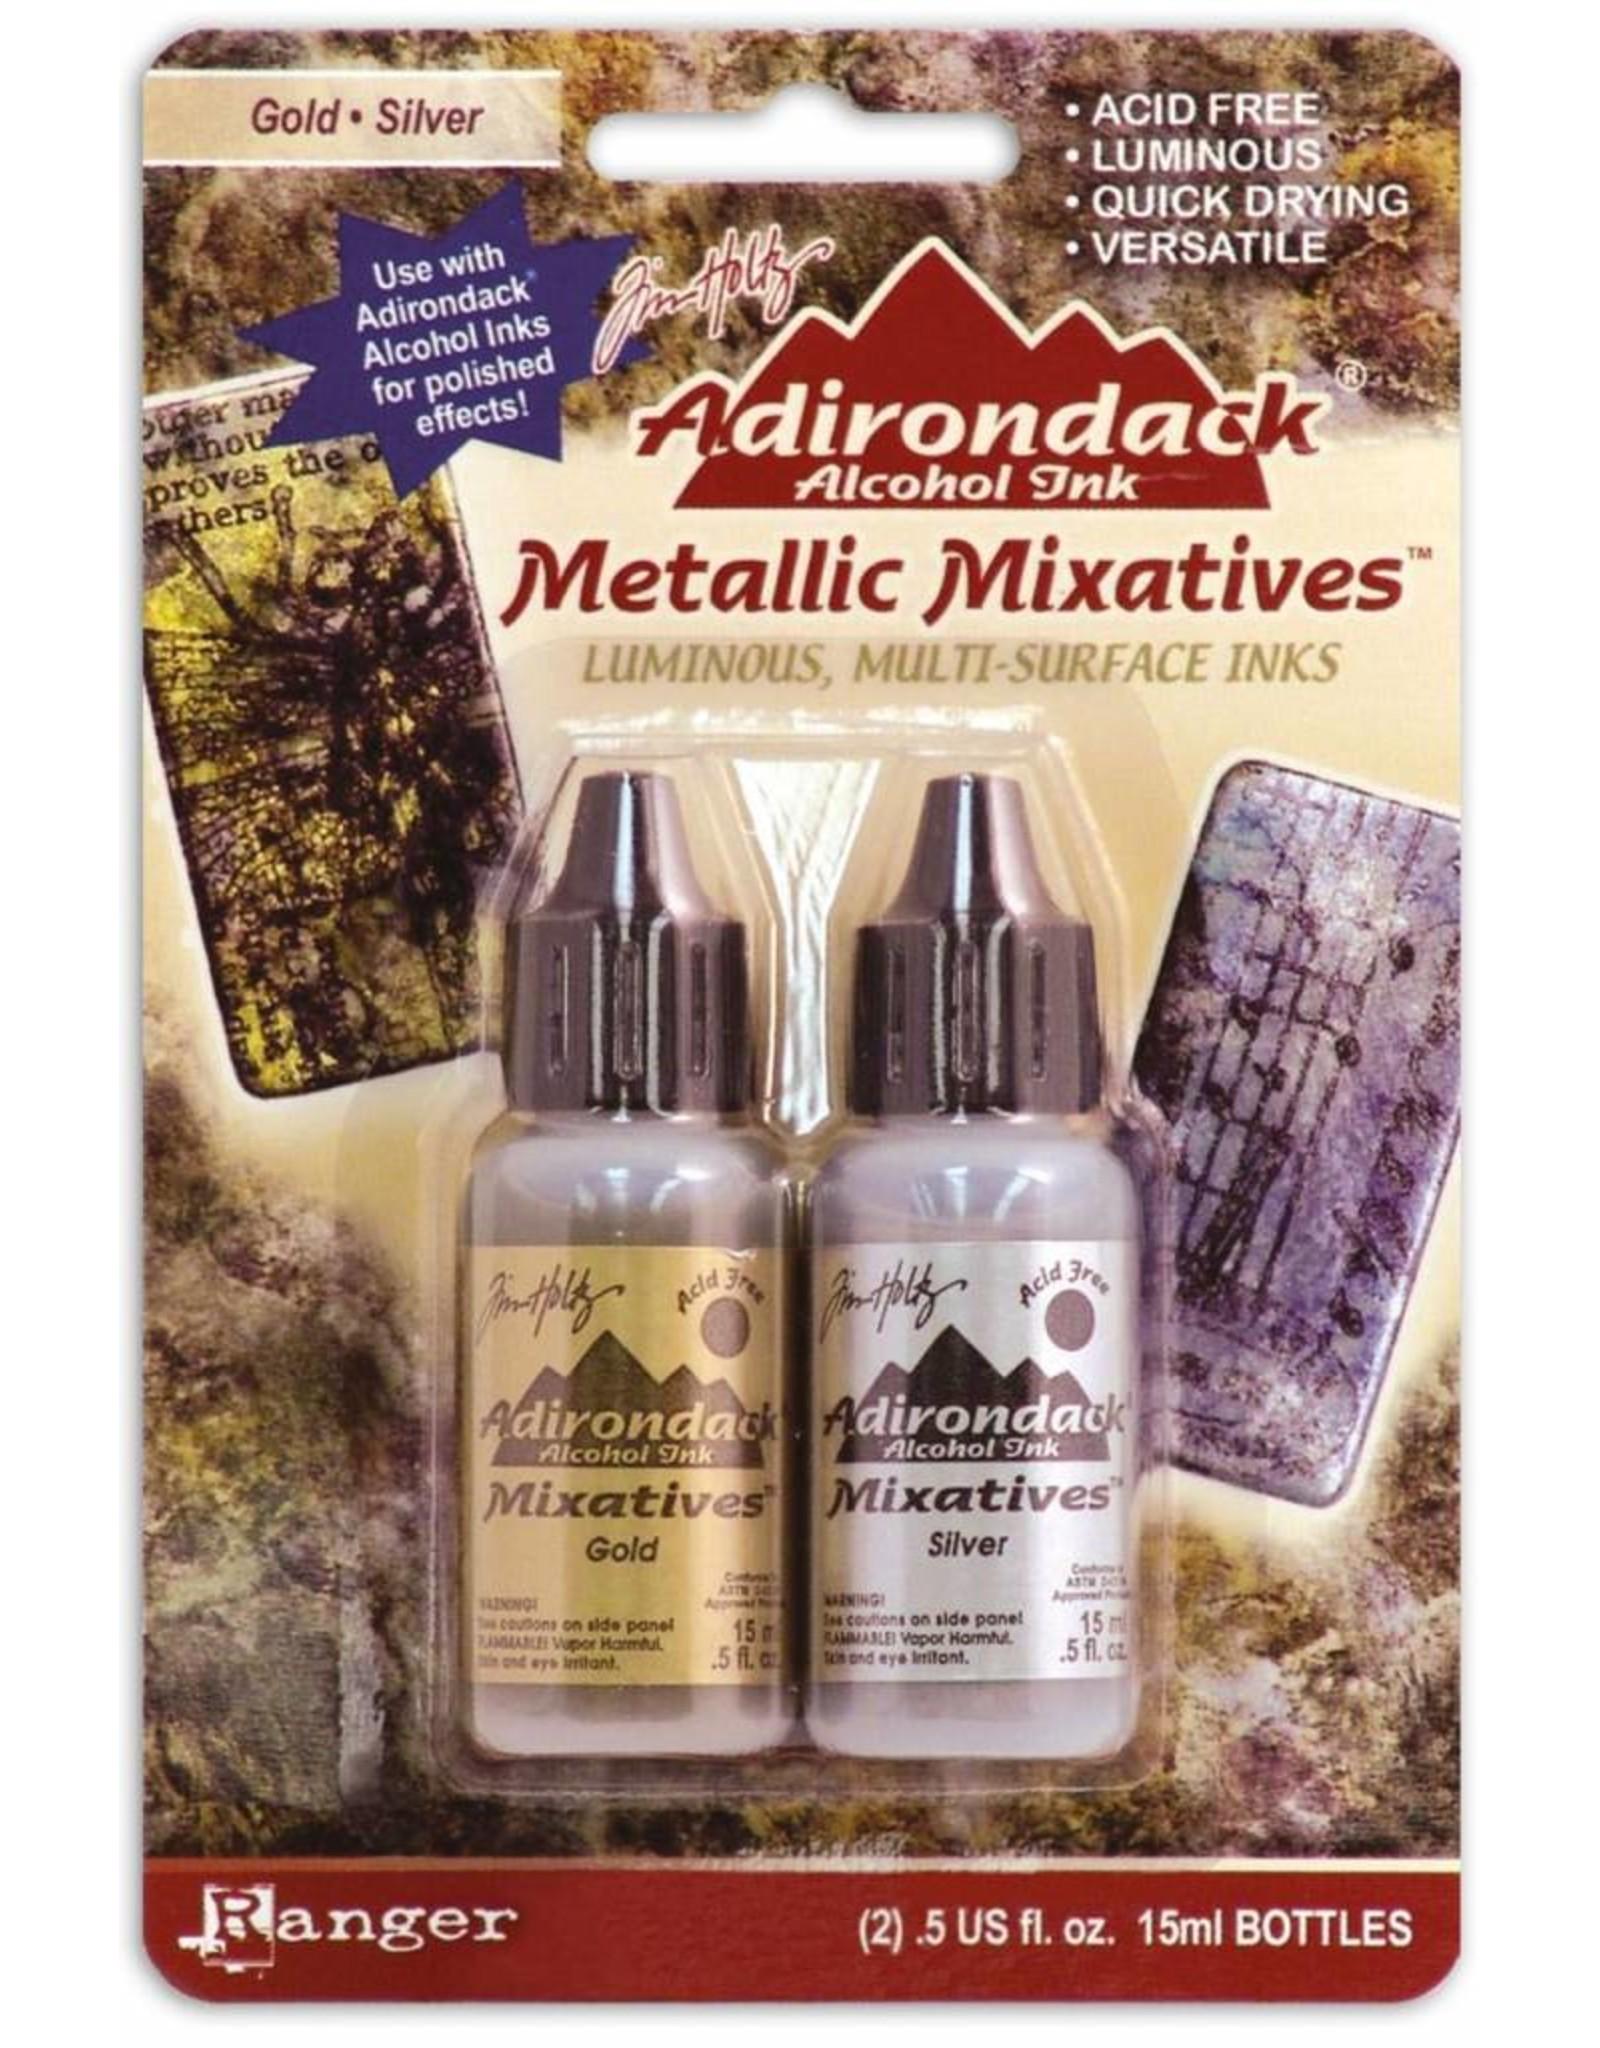 Adirondack Adirondack metallic alcohol mixative kit gold silver*